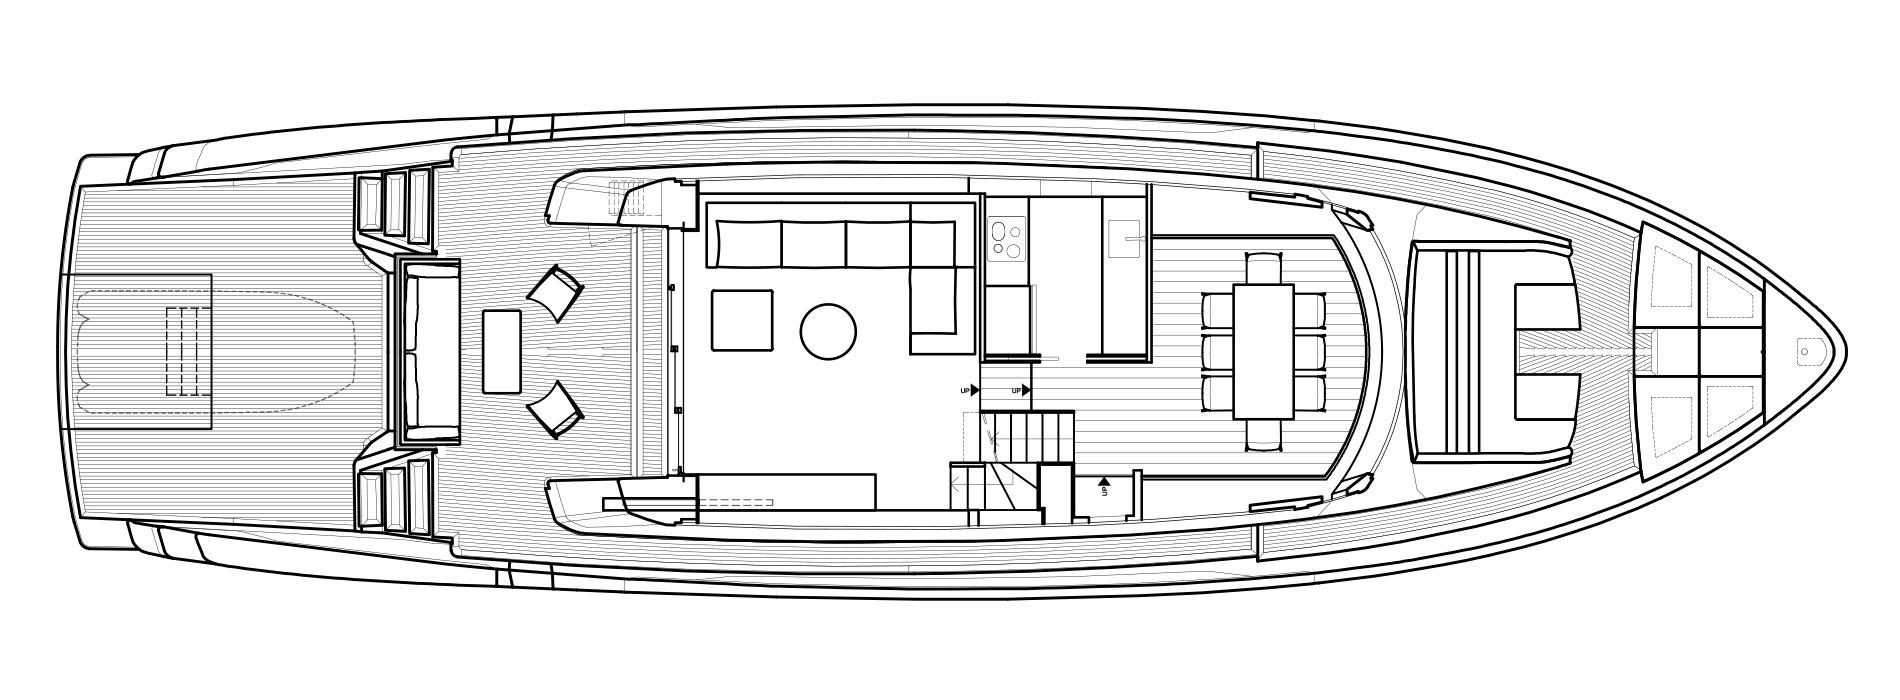 Sanlorenzo Yachts SX76 Hauptdeck Versione A